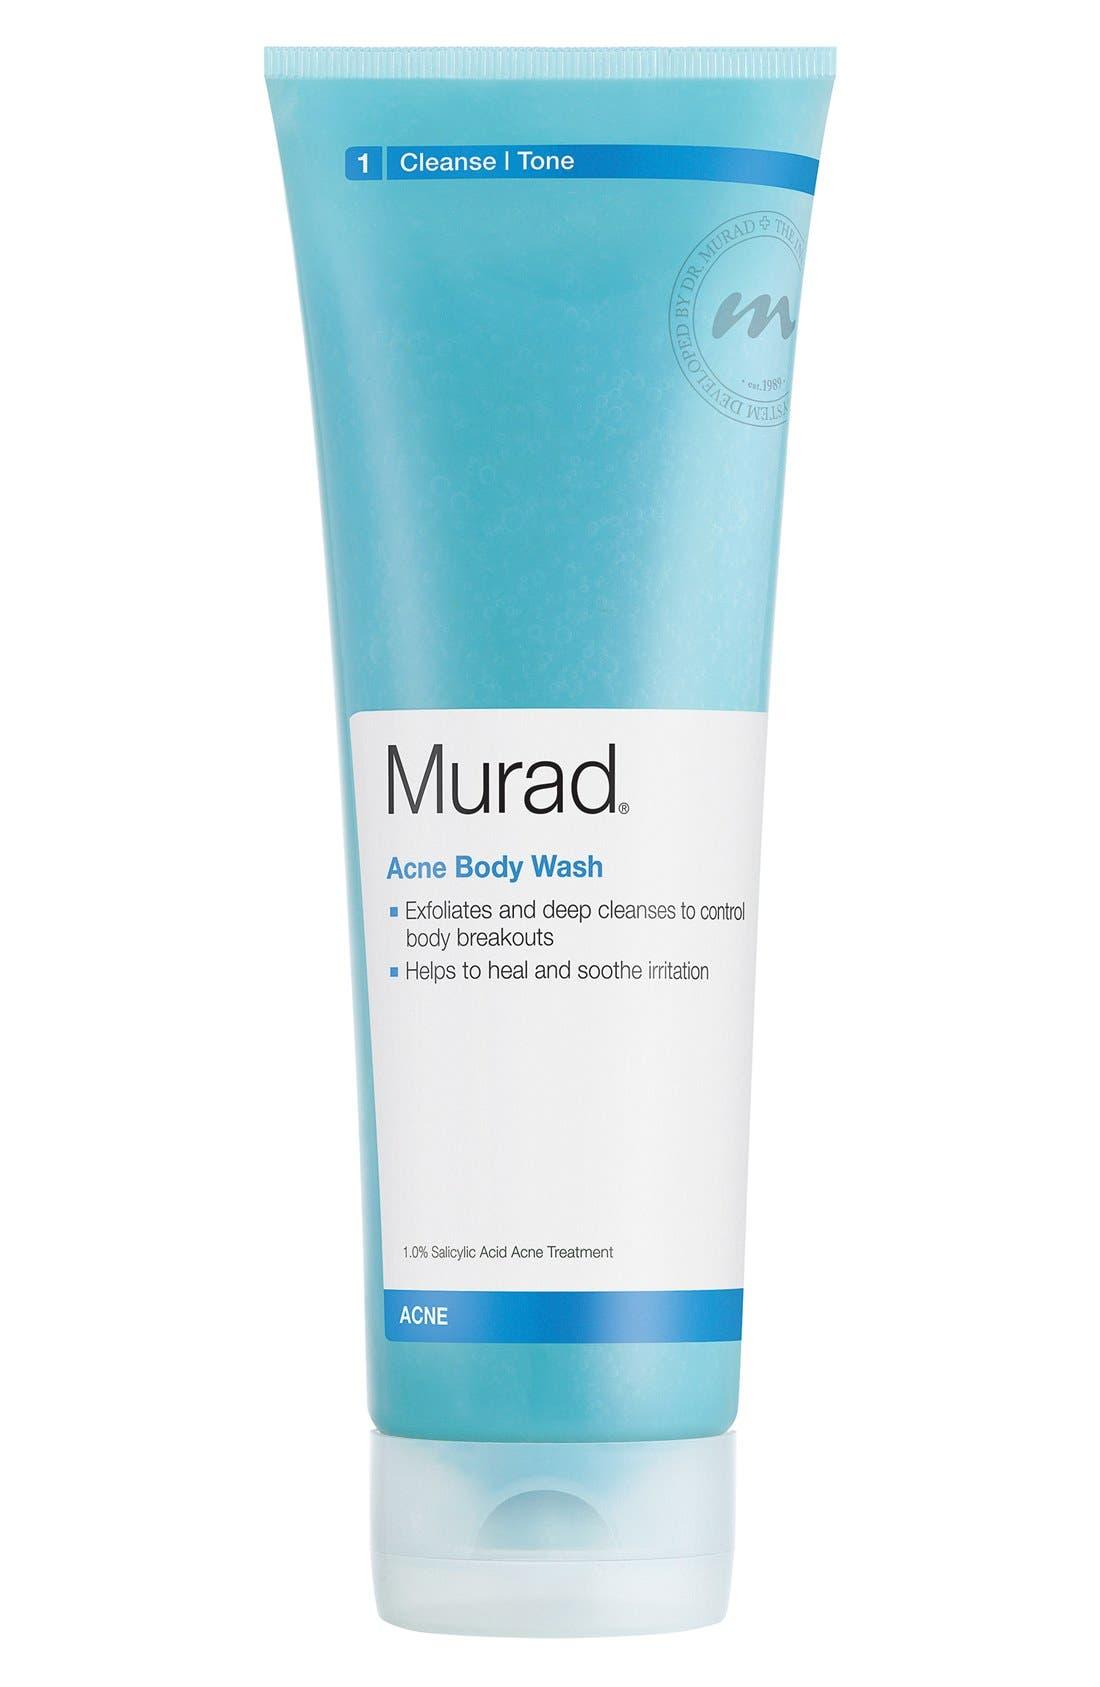 Murad® Acne Body Wash